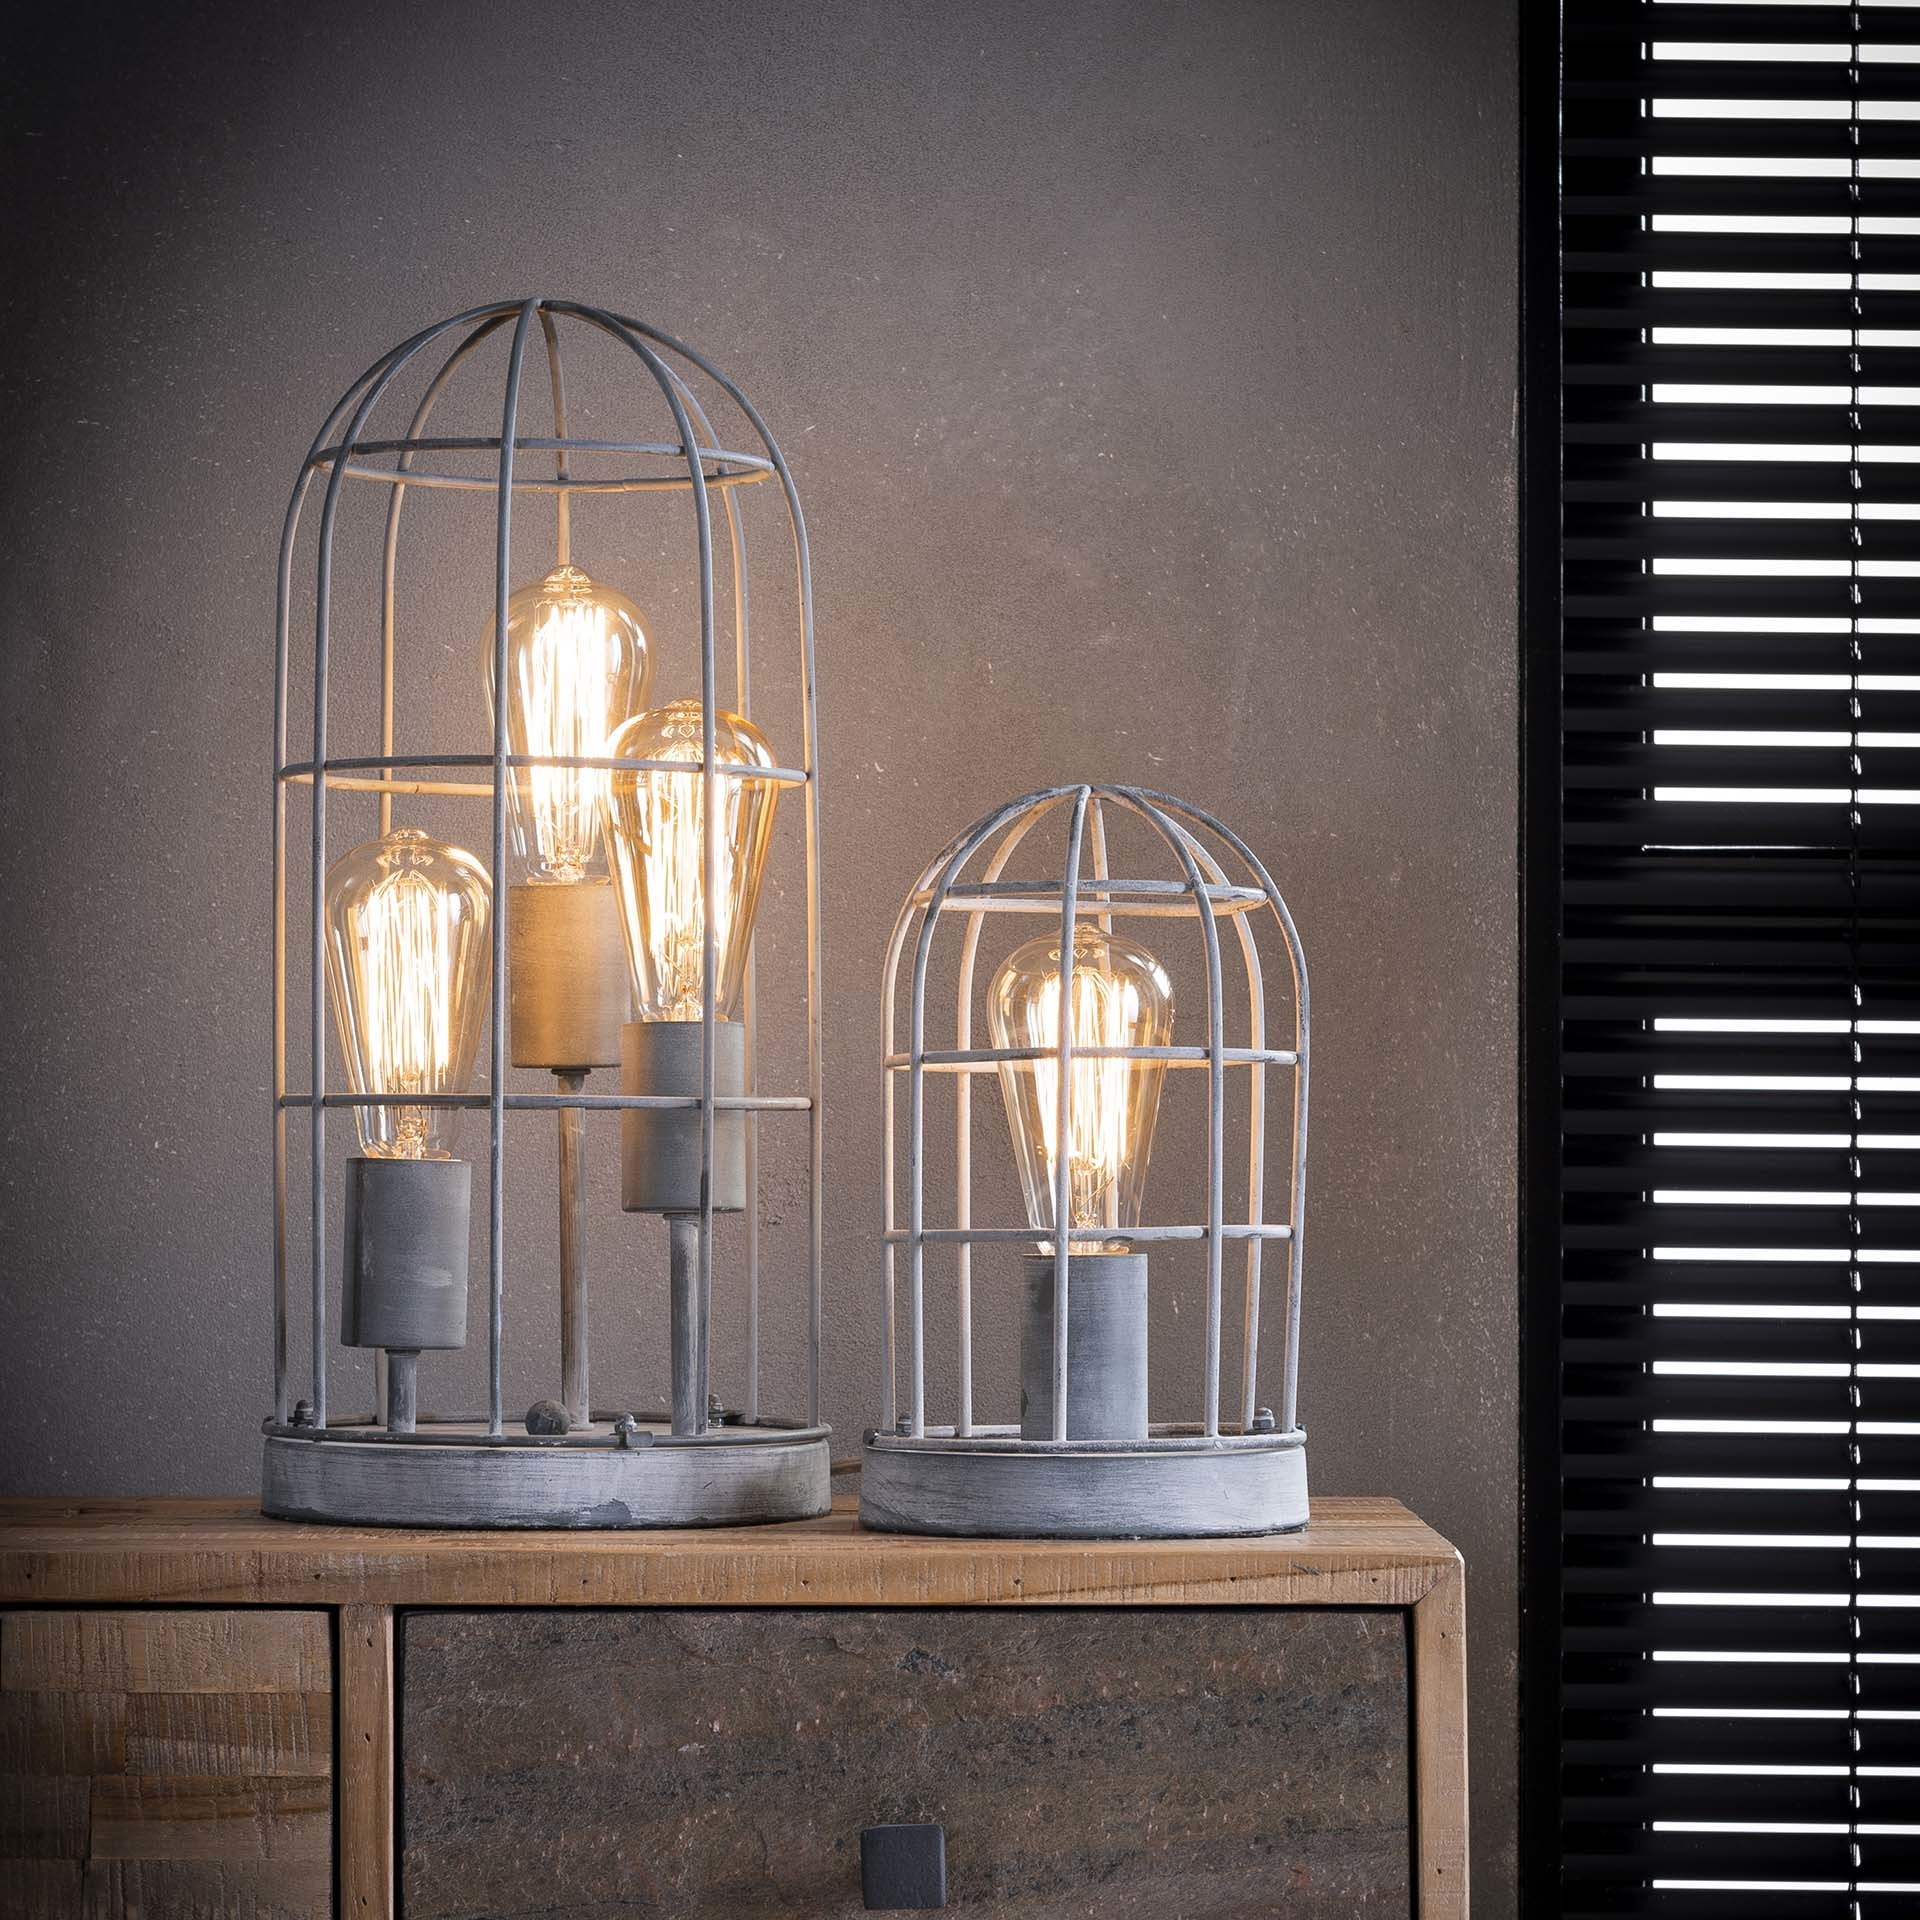 Duverger Cage - Tafellamp - metalen kooi - 3 lichtpunten - grijs - dia 20cm